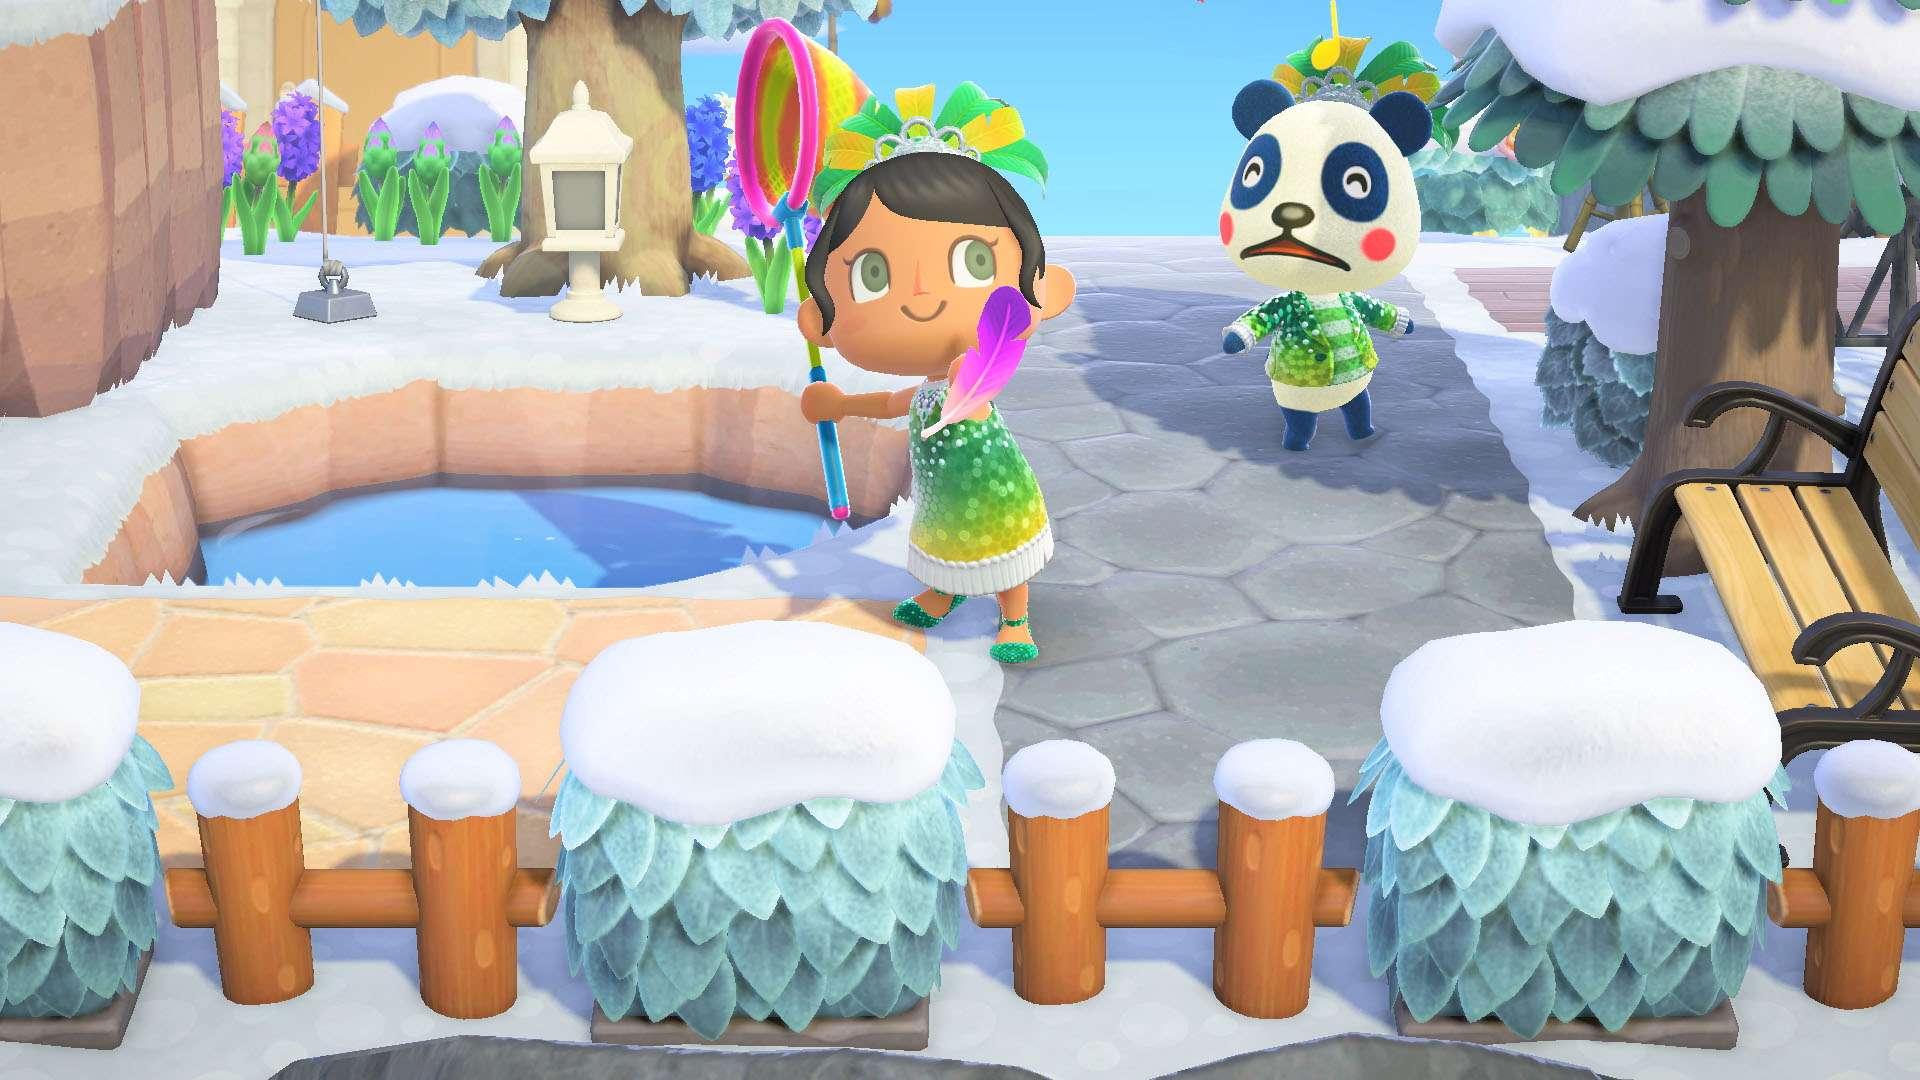 Animal Crossing New Horizons Carnaval Actualizacion 1 - El Carnaval llega a Animal Crossing: New Horizons